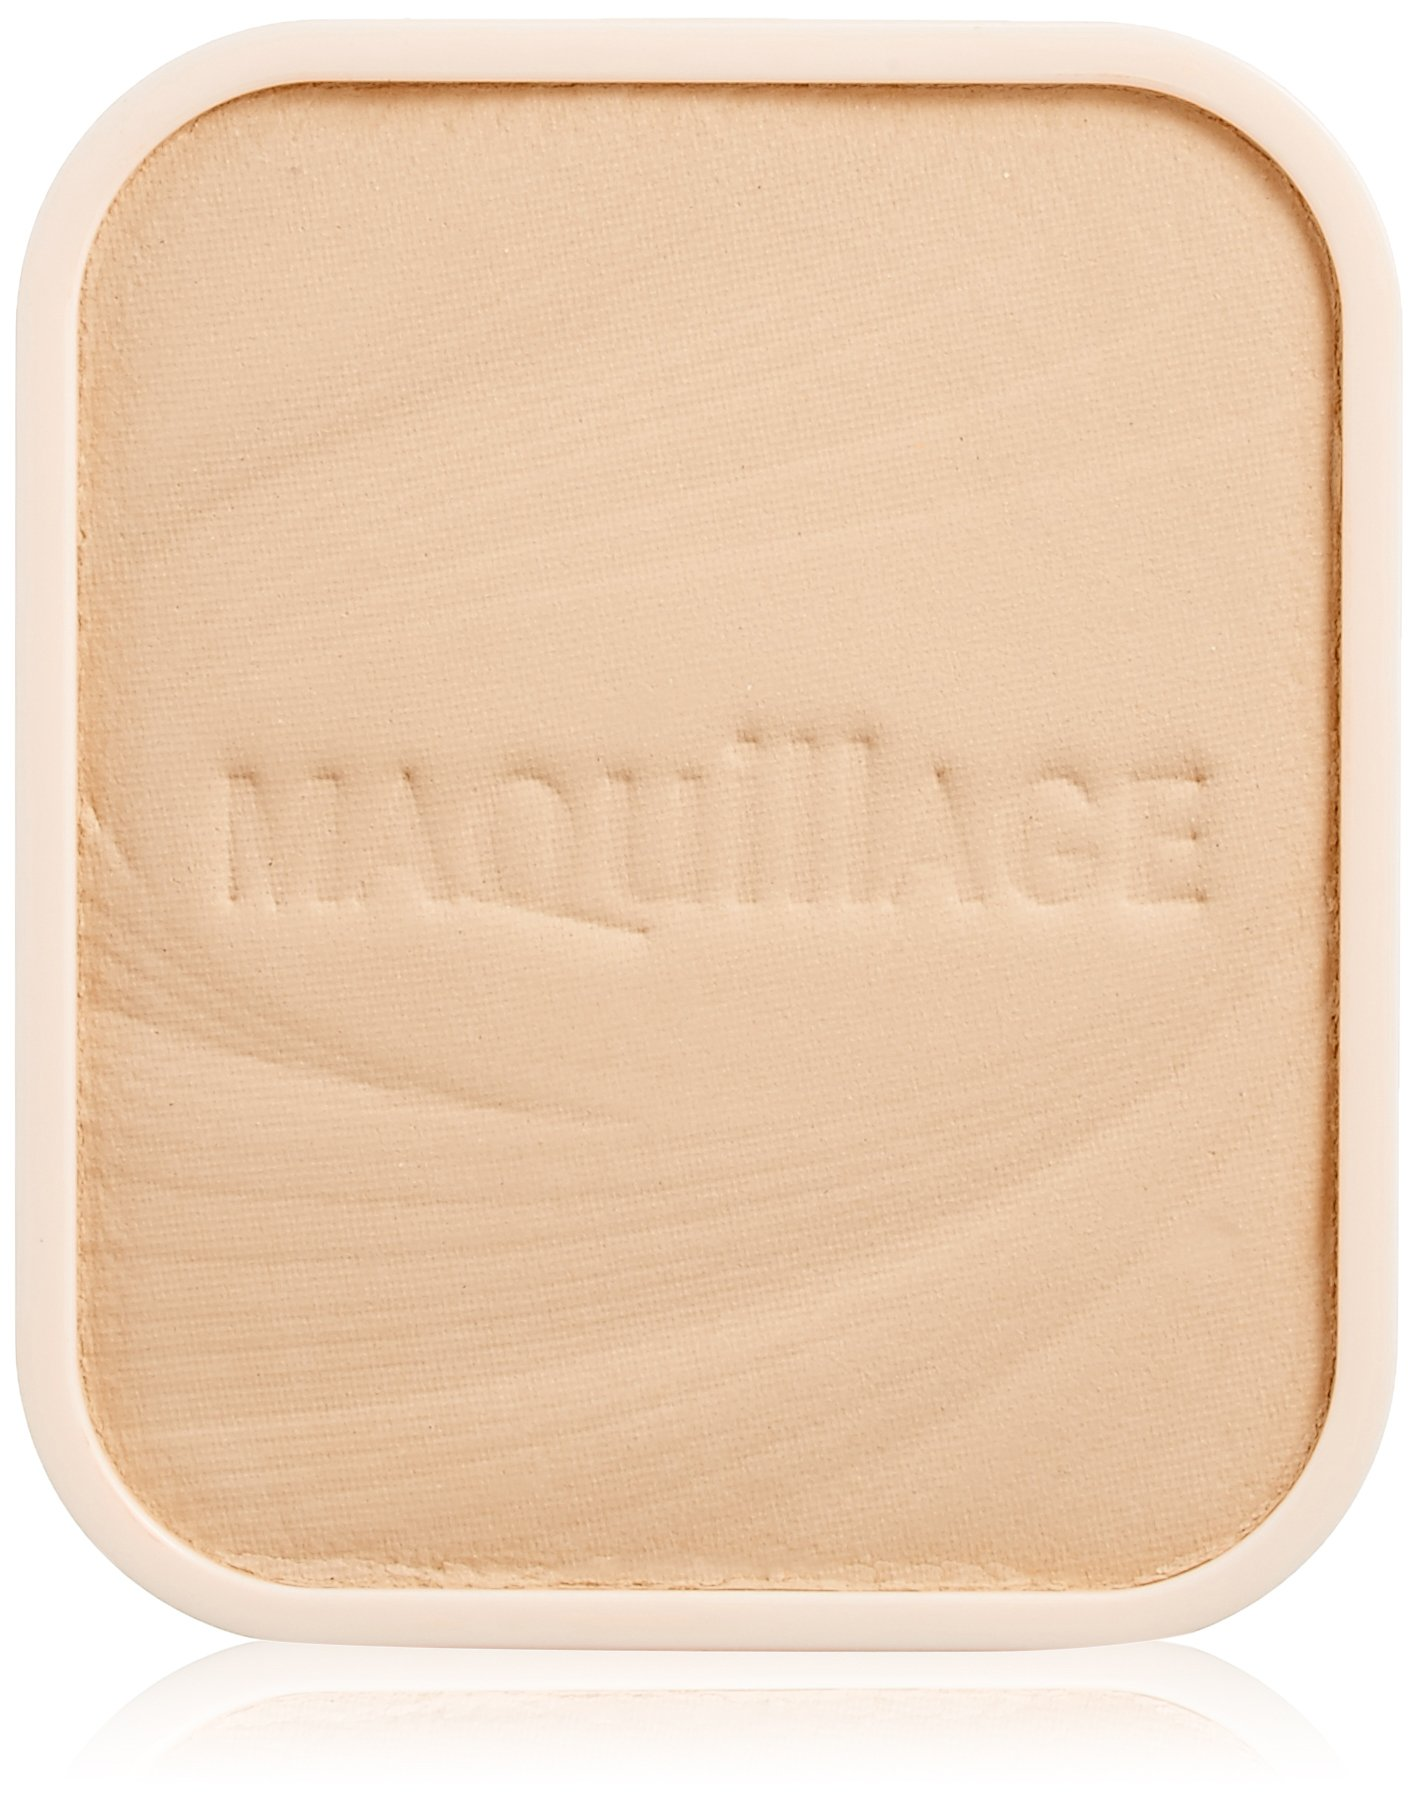 Shiseido MAQuillAGE Dramatic Powdery UV Foundation SPF25 PA++ #OC10 (OC# 10)